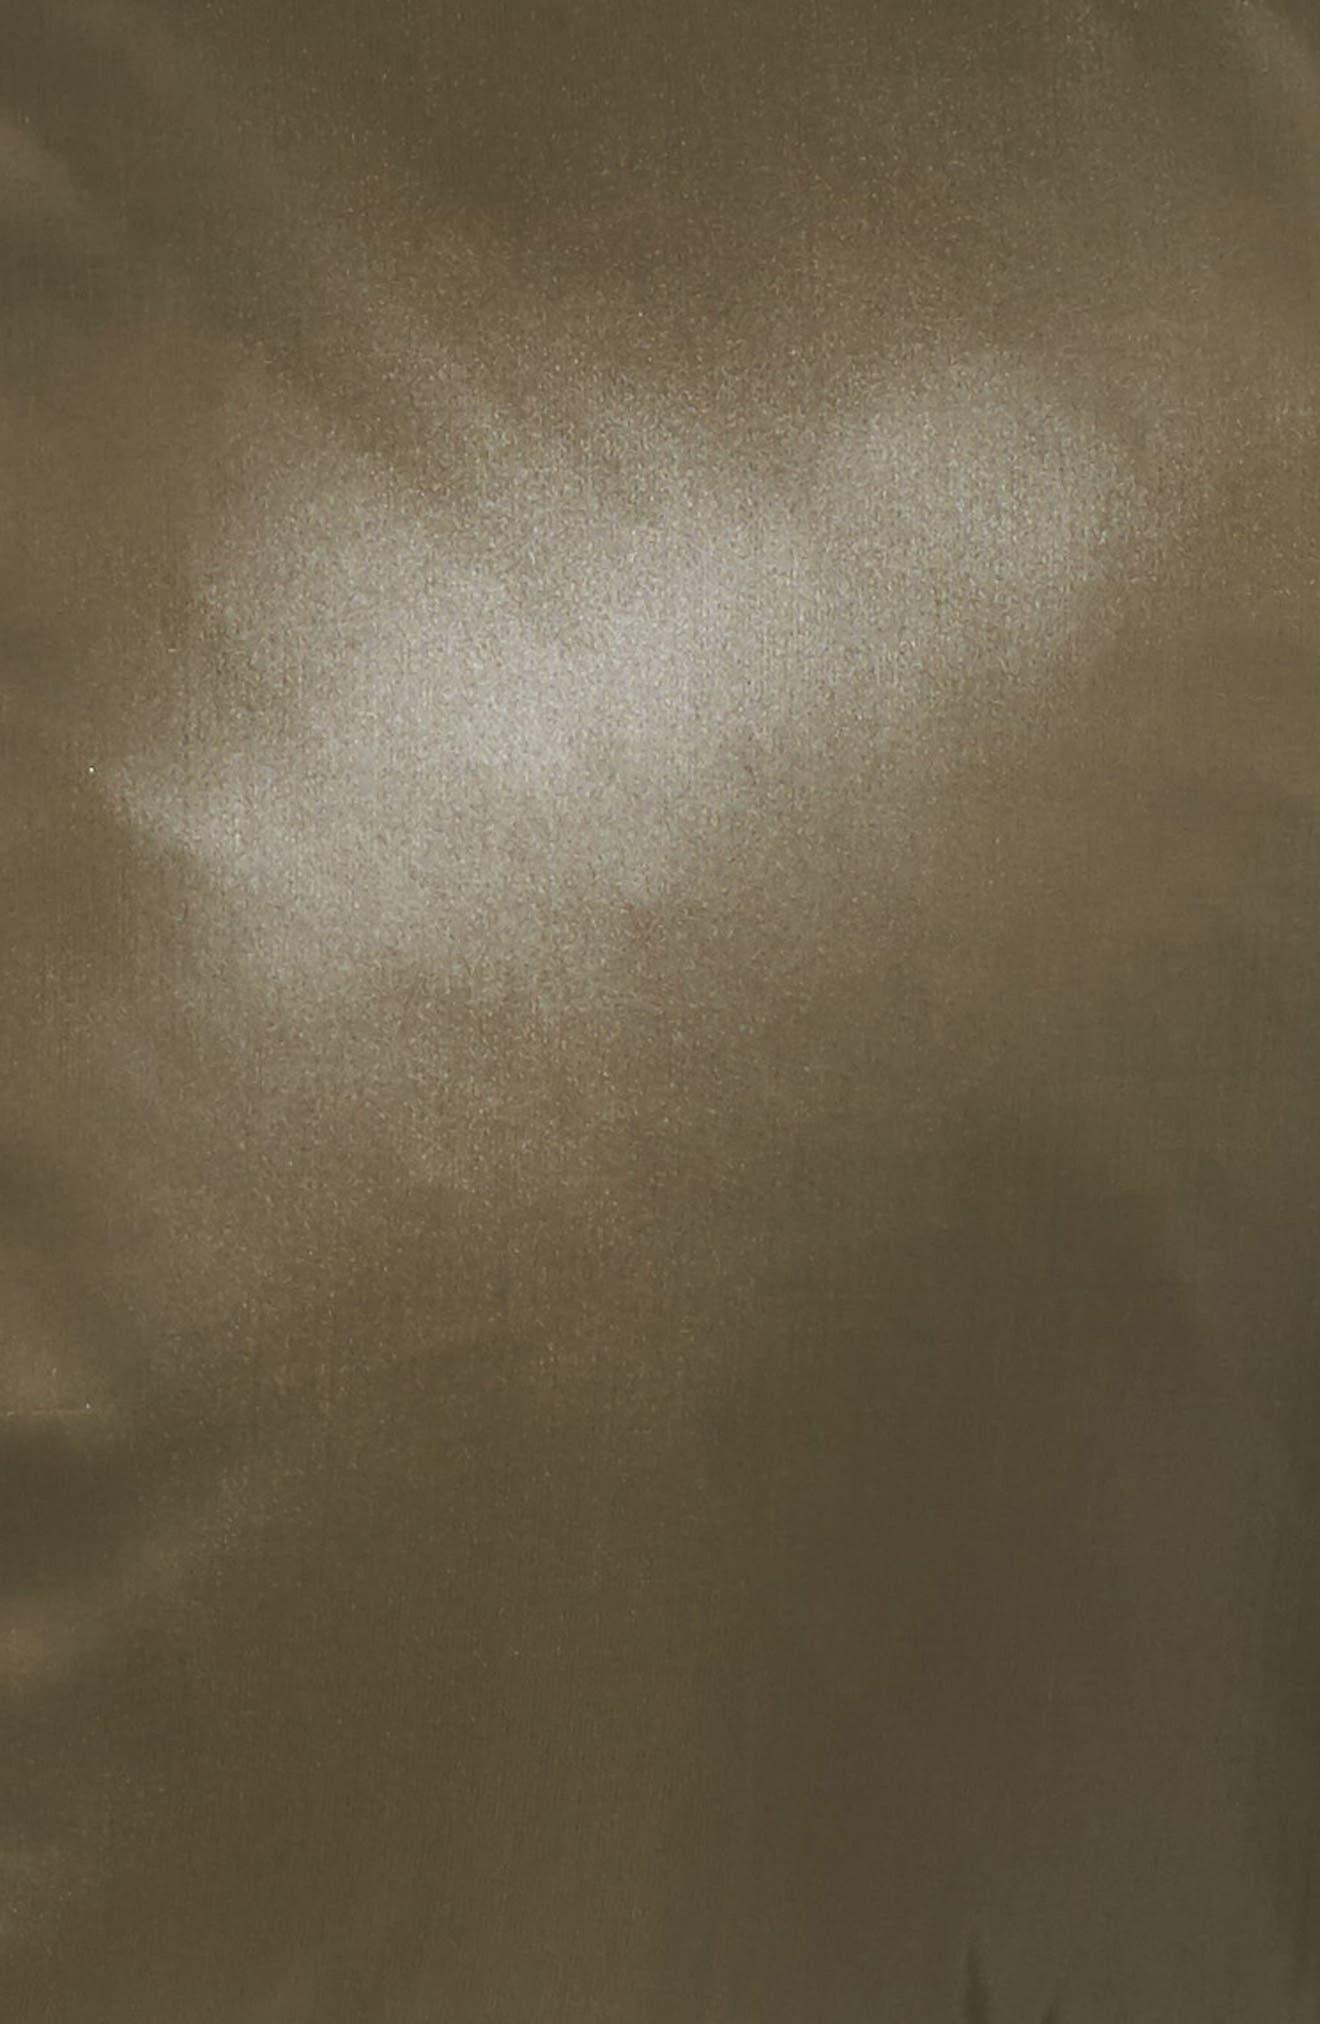 Kylie Faux Fur Trim Gloss Puffer Jacket,                             Alternate thumbnail 25, color,